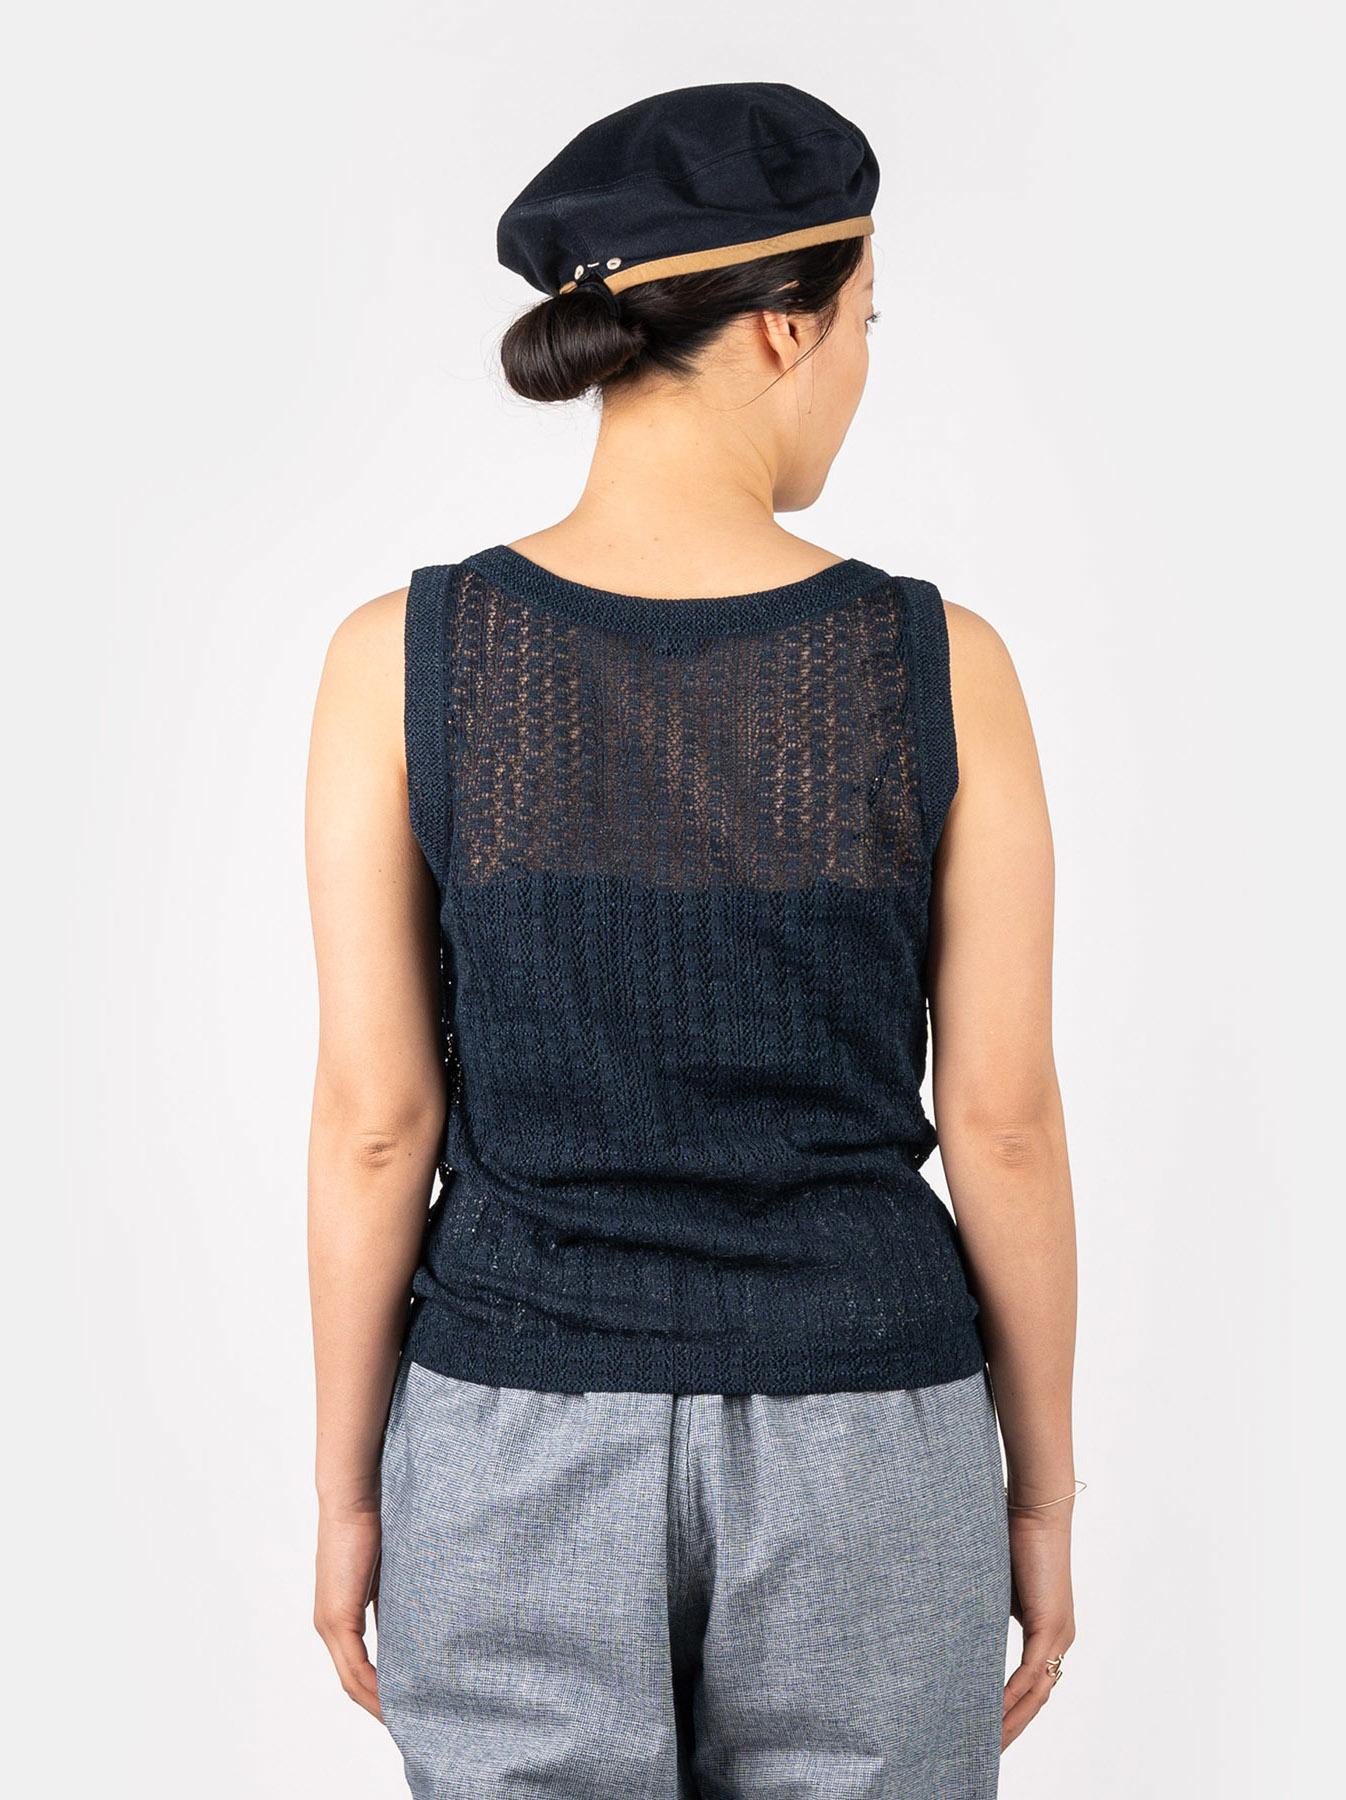 WH Indigo Gima Knit Lace Sleeveless Top-5